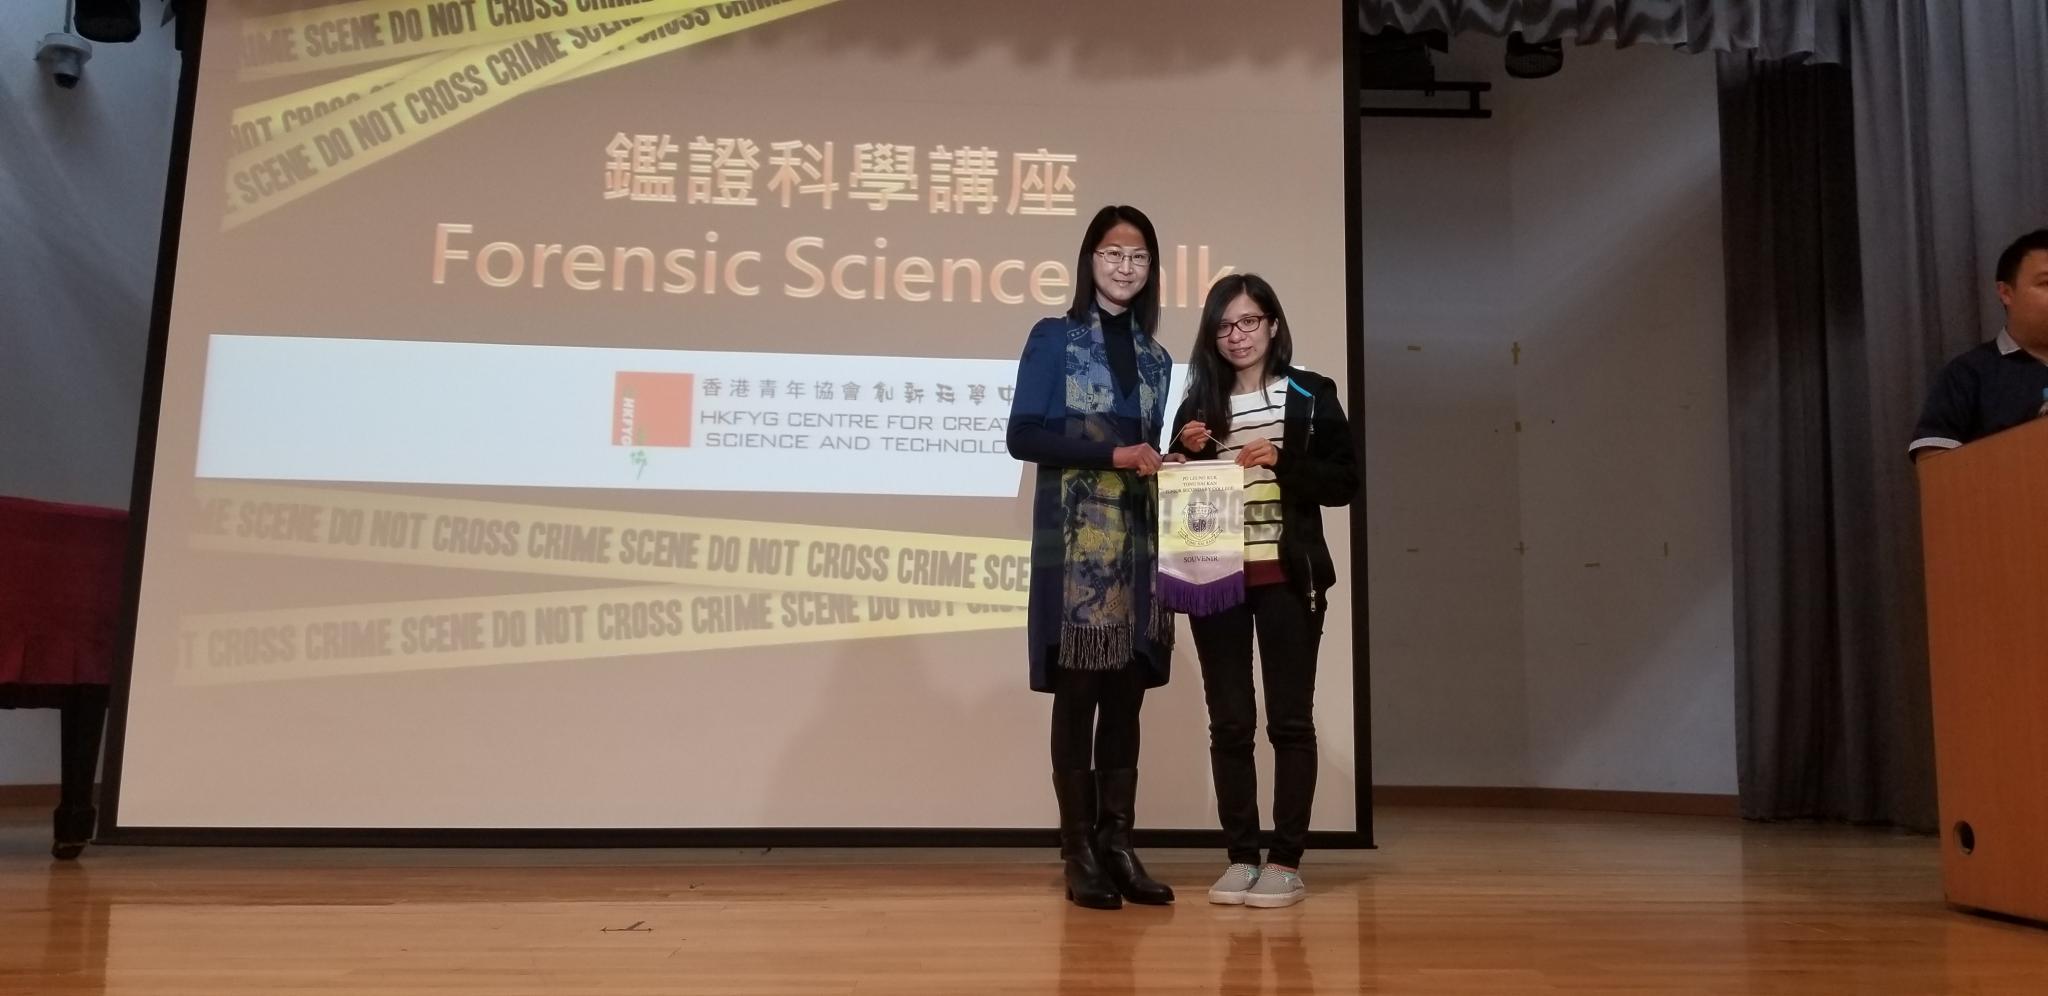 Vice-principal Ms. Lau Pik Shan presented a souvenir to Ms. Jessica Chan.